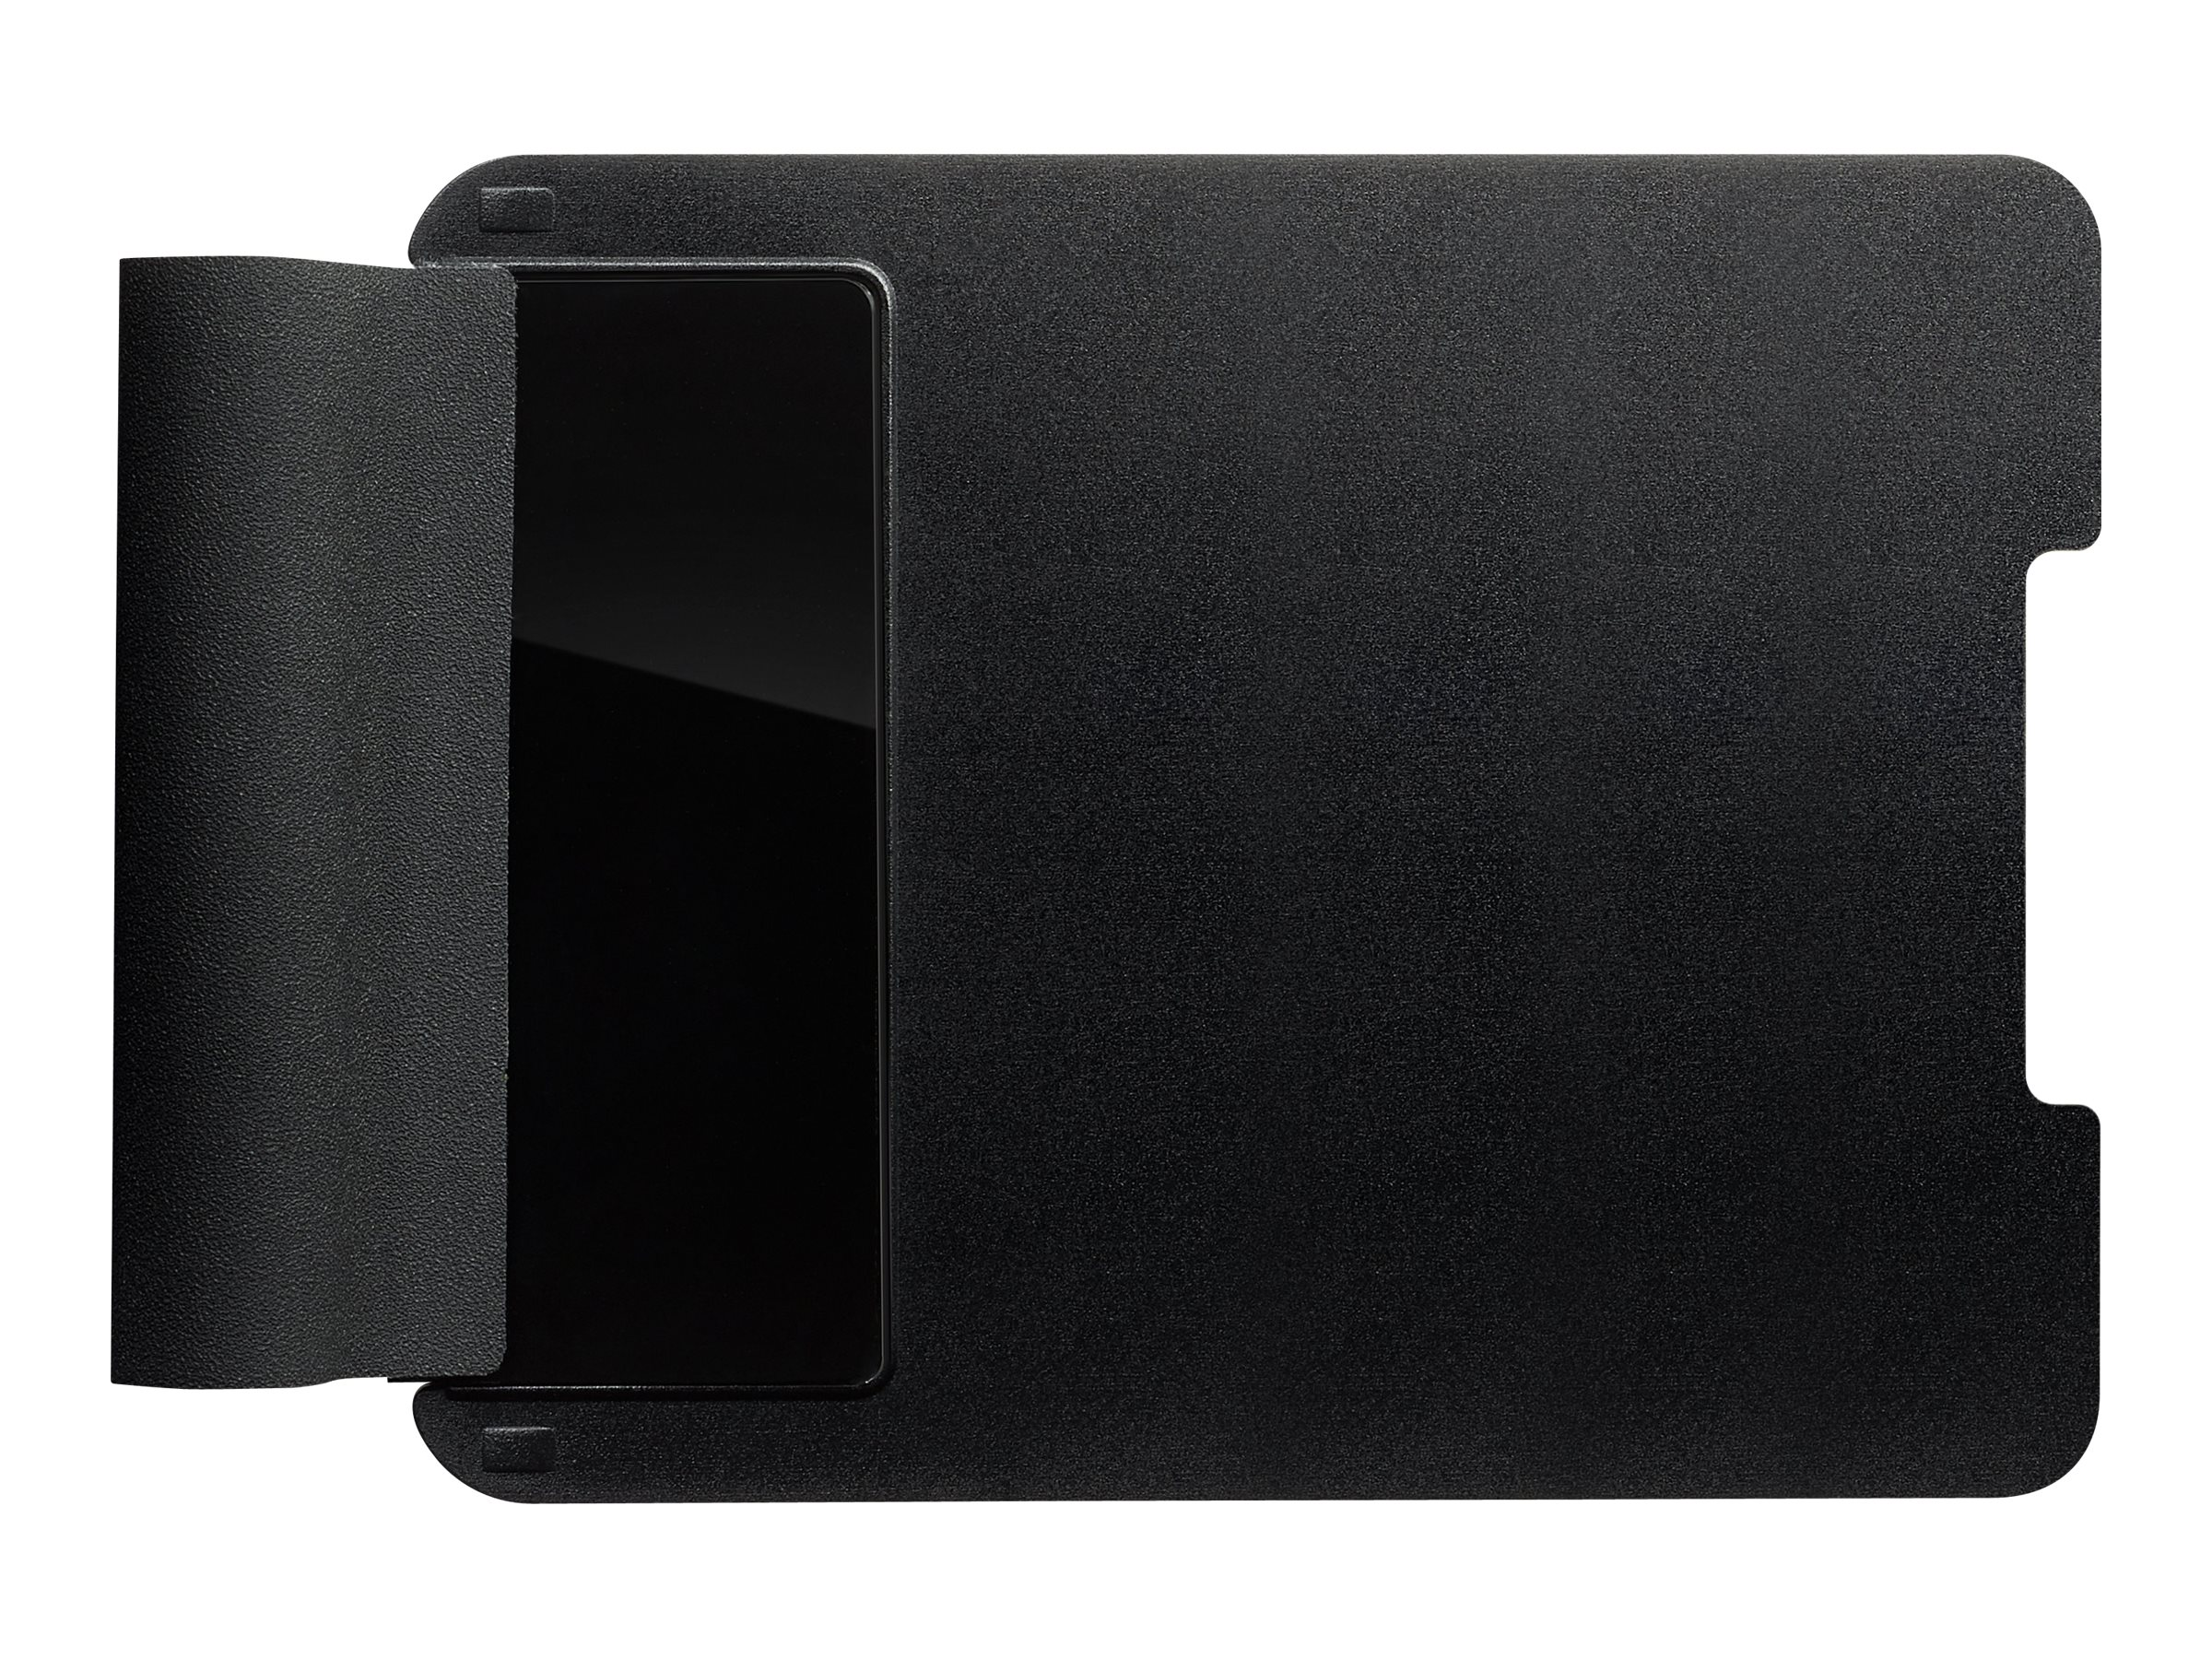 HP SmartCard Pen Holder for EliteBook x360 1030 G2